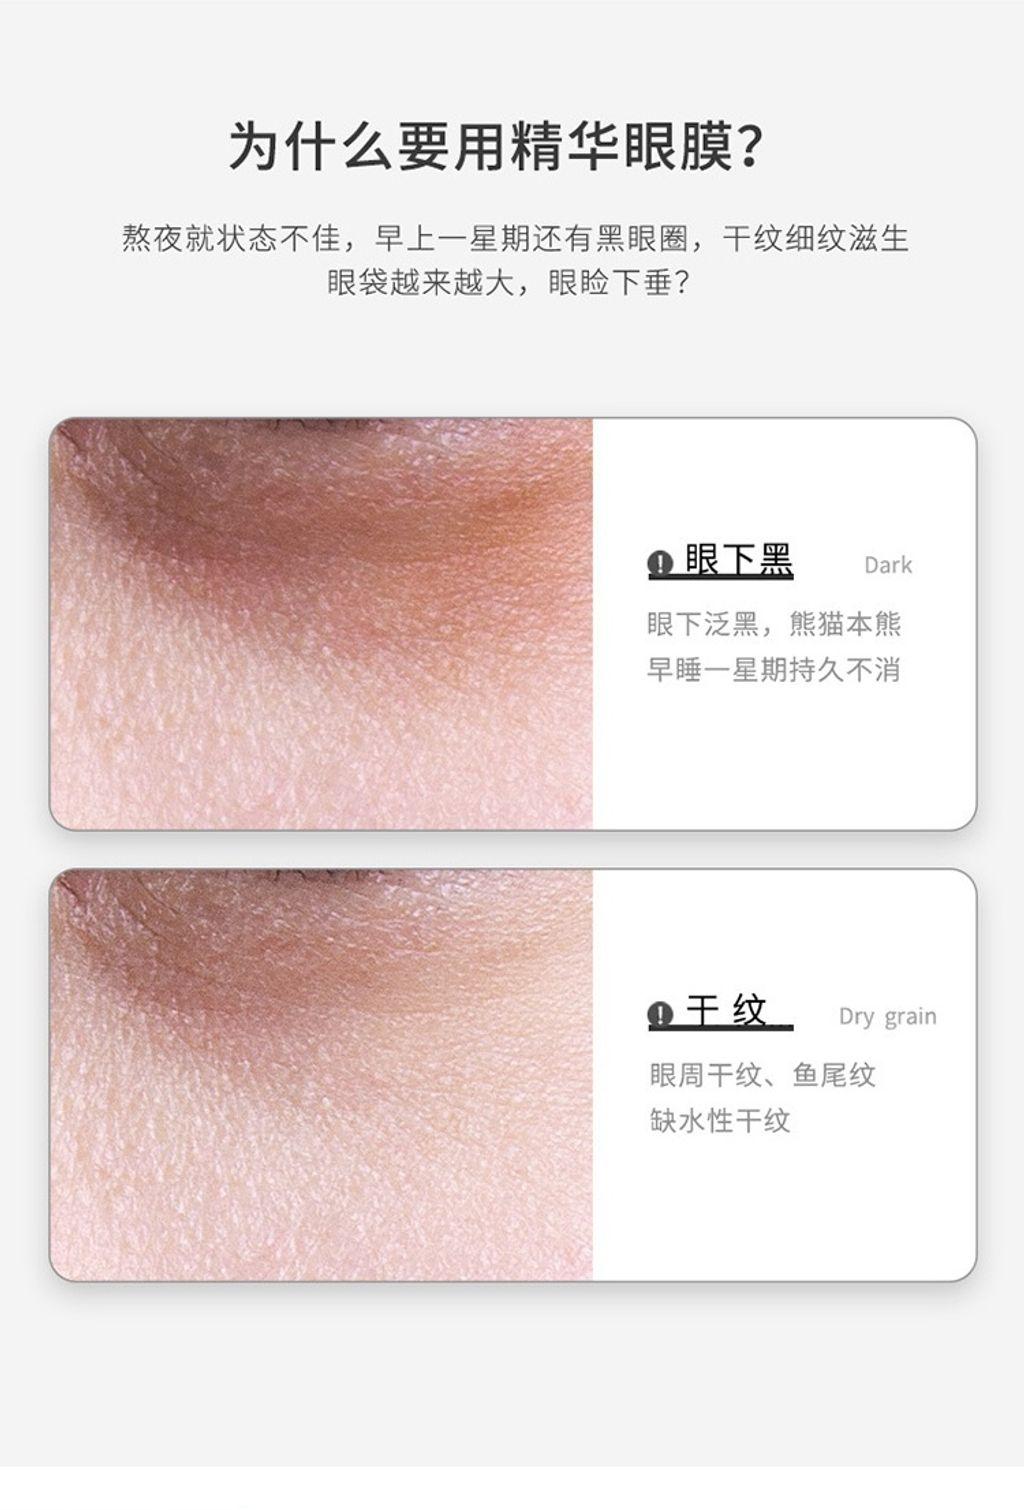 JuzBeauty_JuzBeautyMalaysia_JuzPretty_Authentic_Kbeauty_Malaysia_Jbeauty_FNP_Caffeine_Refreshing_Eye_Mask_FNP_Polypeptide_Wrinkle_Eraser_Eye_Mask_ (10).jpg